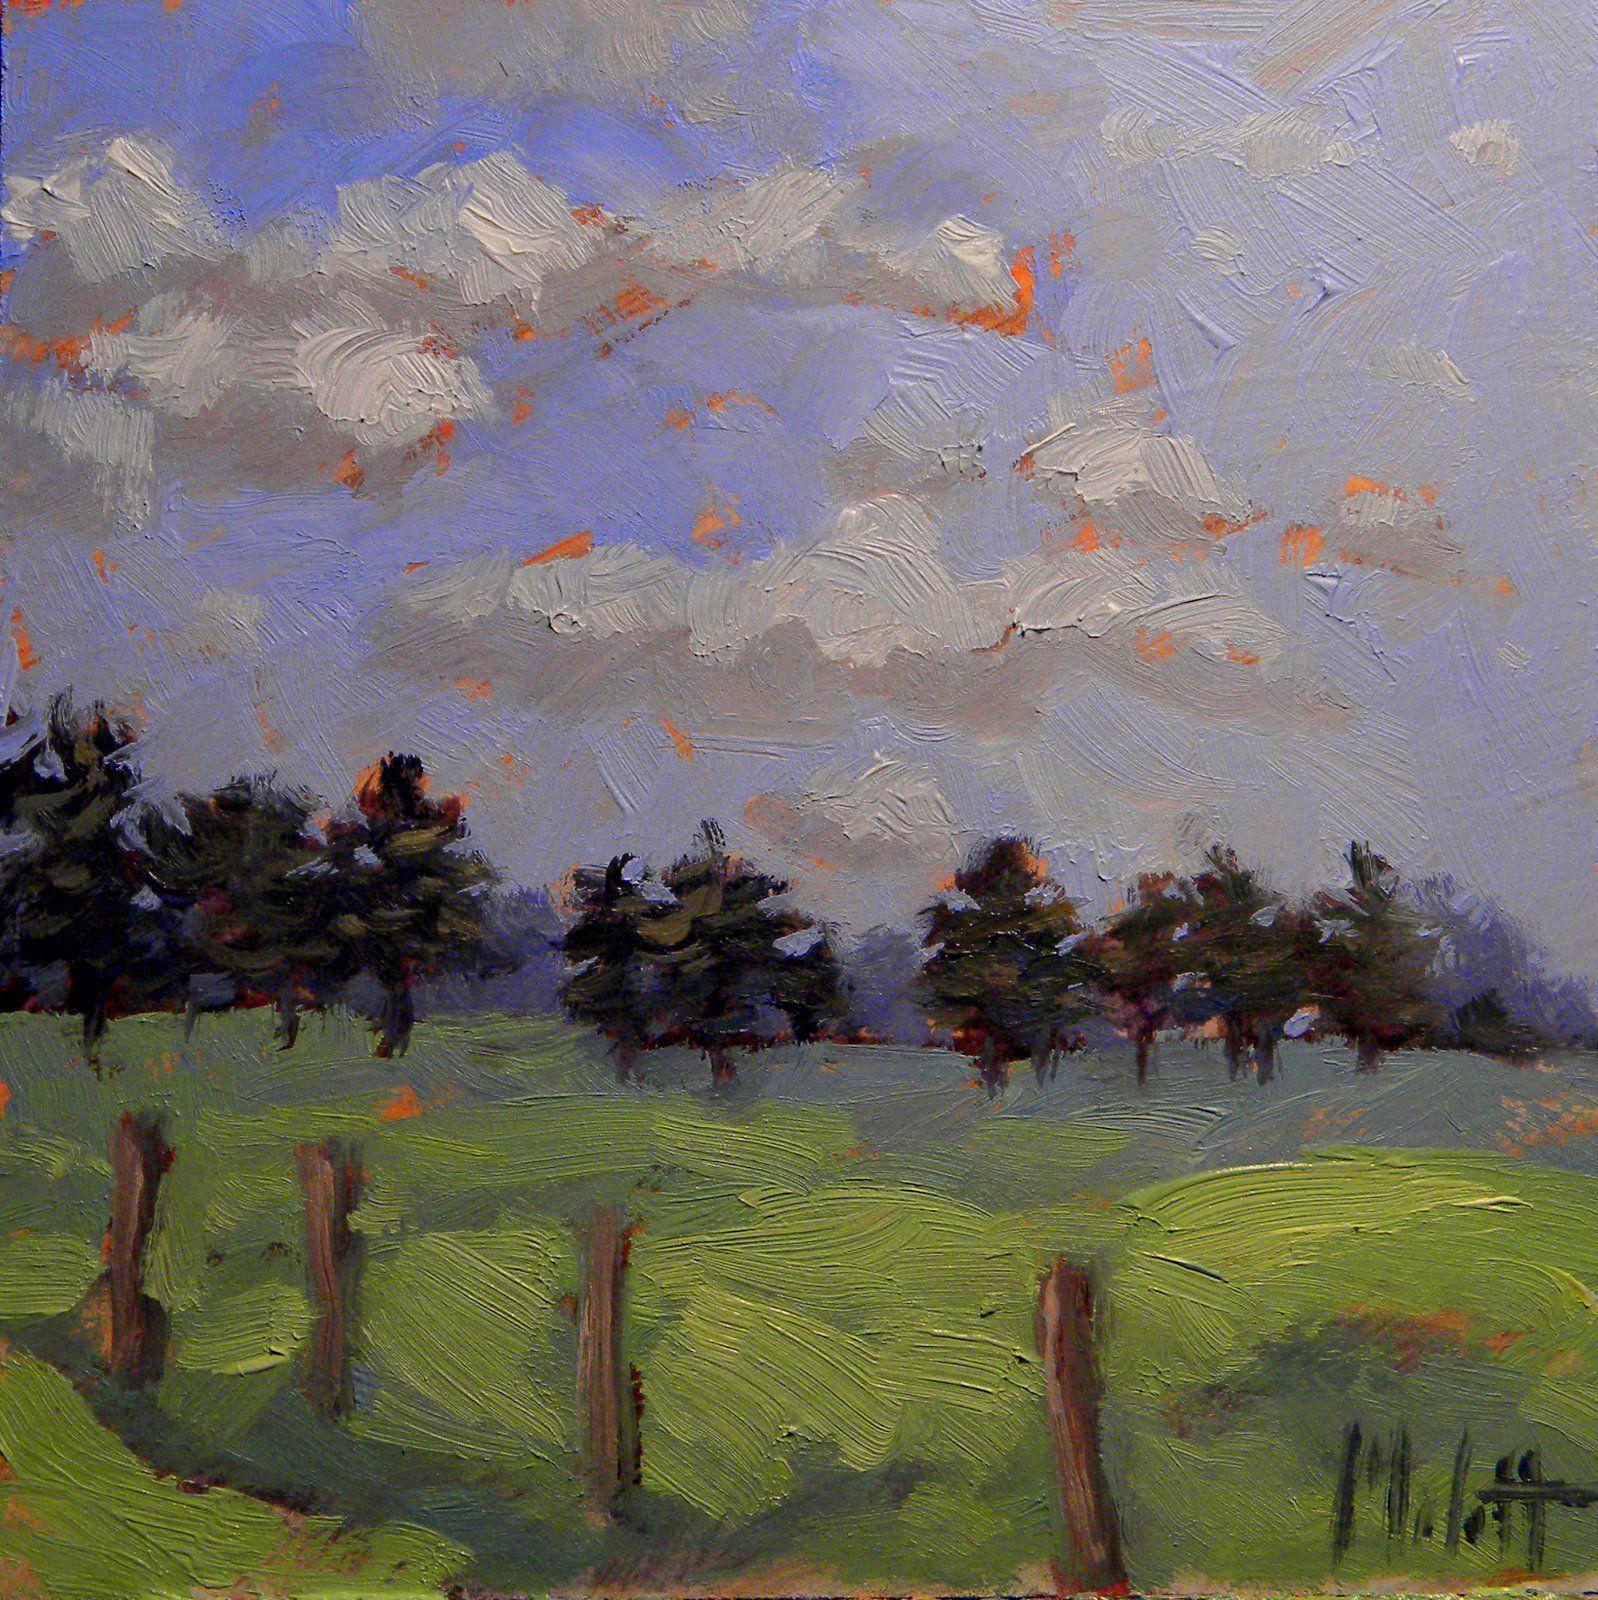 35ef0cc6f Landscape paintings for sale – original landscape paintings by famous  artists exposition in online art gallery. Description from delopr.com.